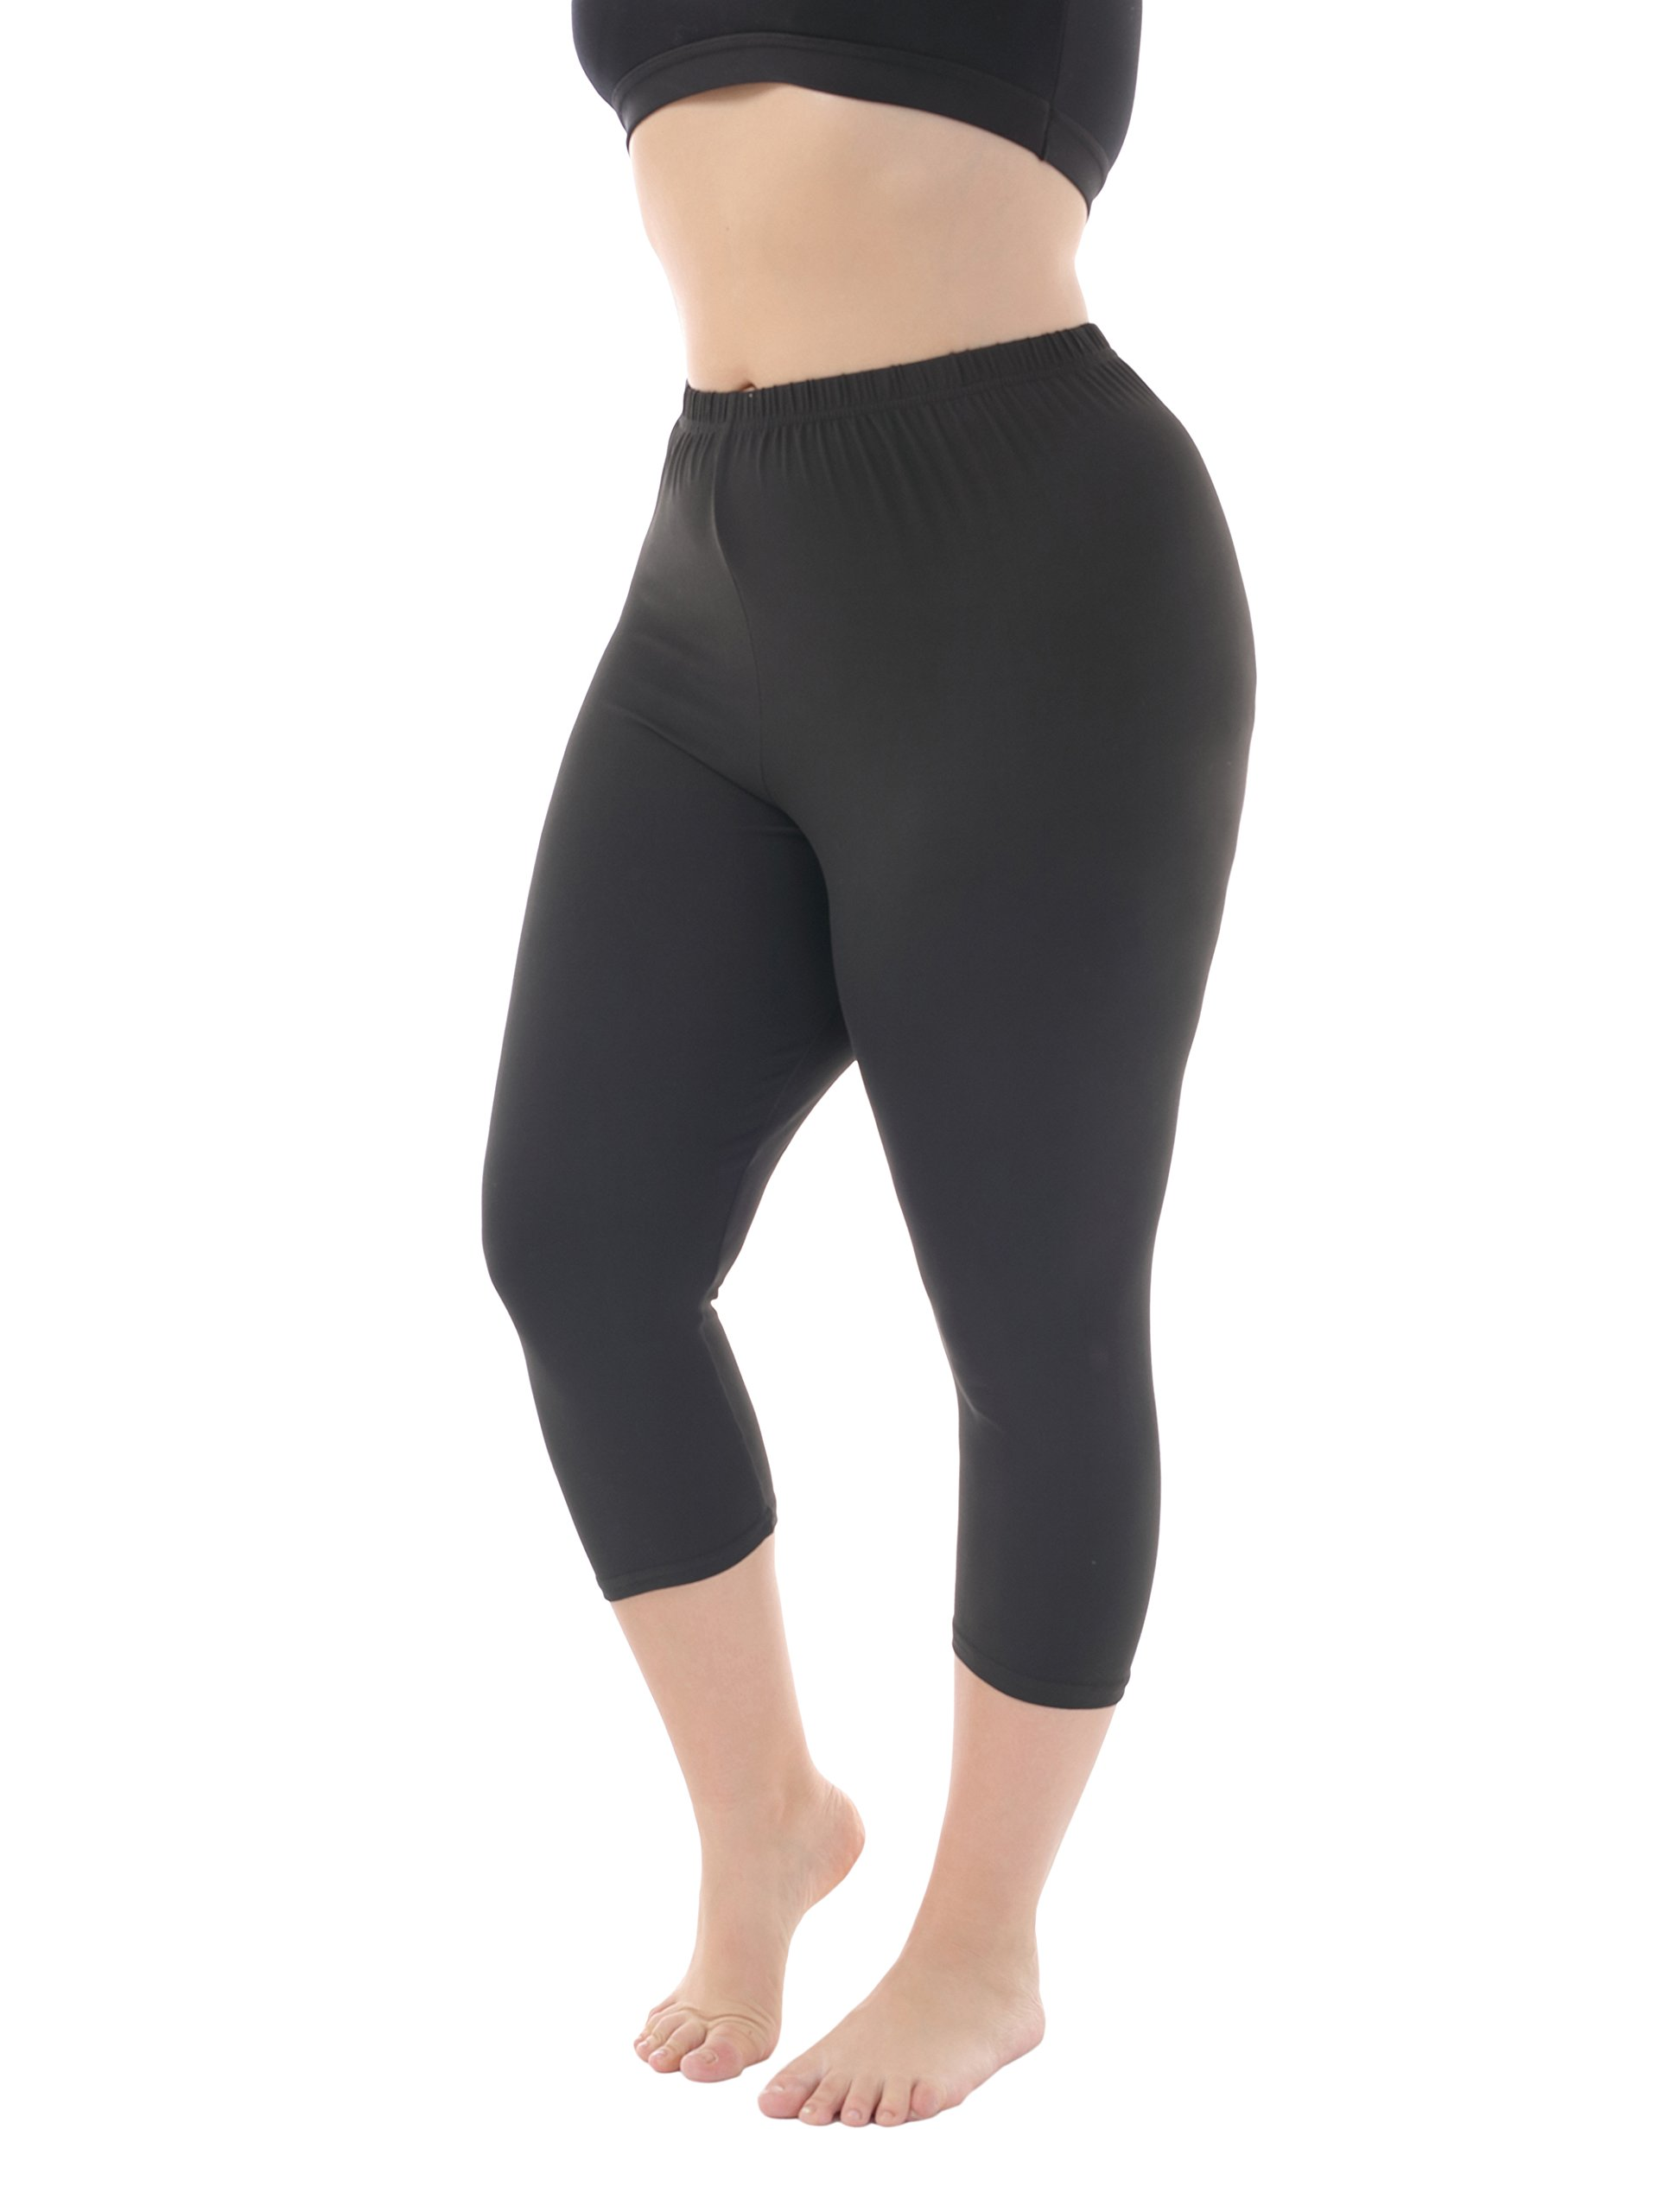 ZERDOCEAN Women's Plus Size Lightweight Printed Capri Leggings style-008 4X